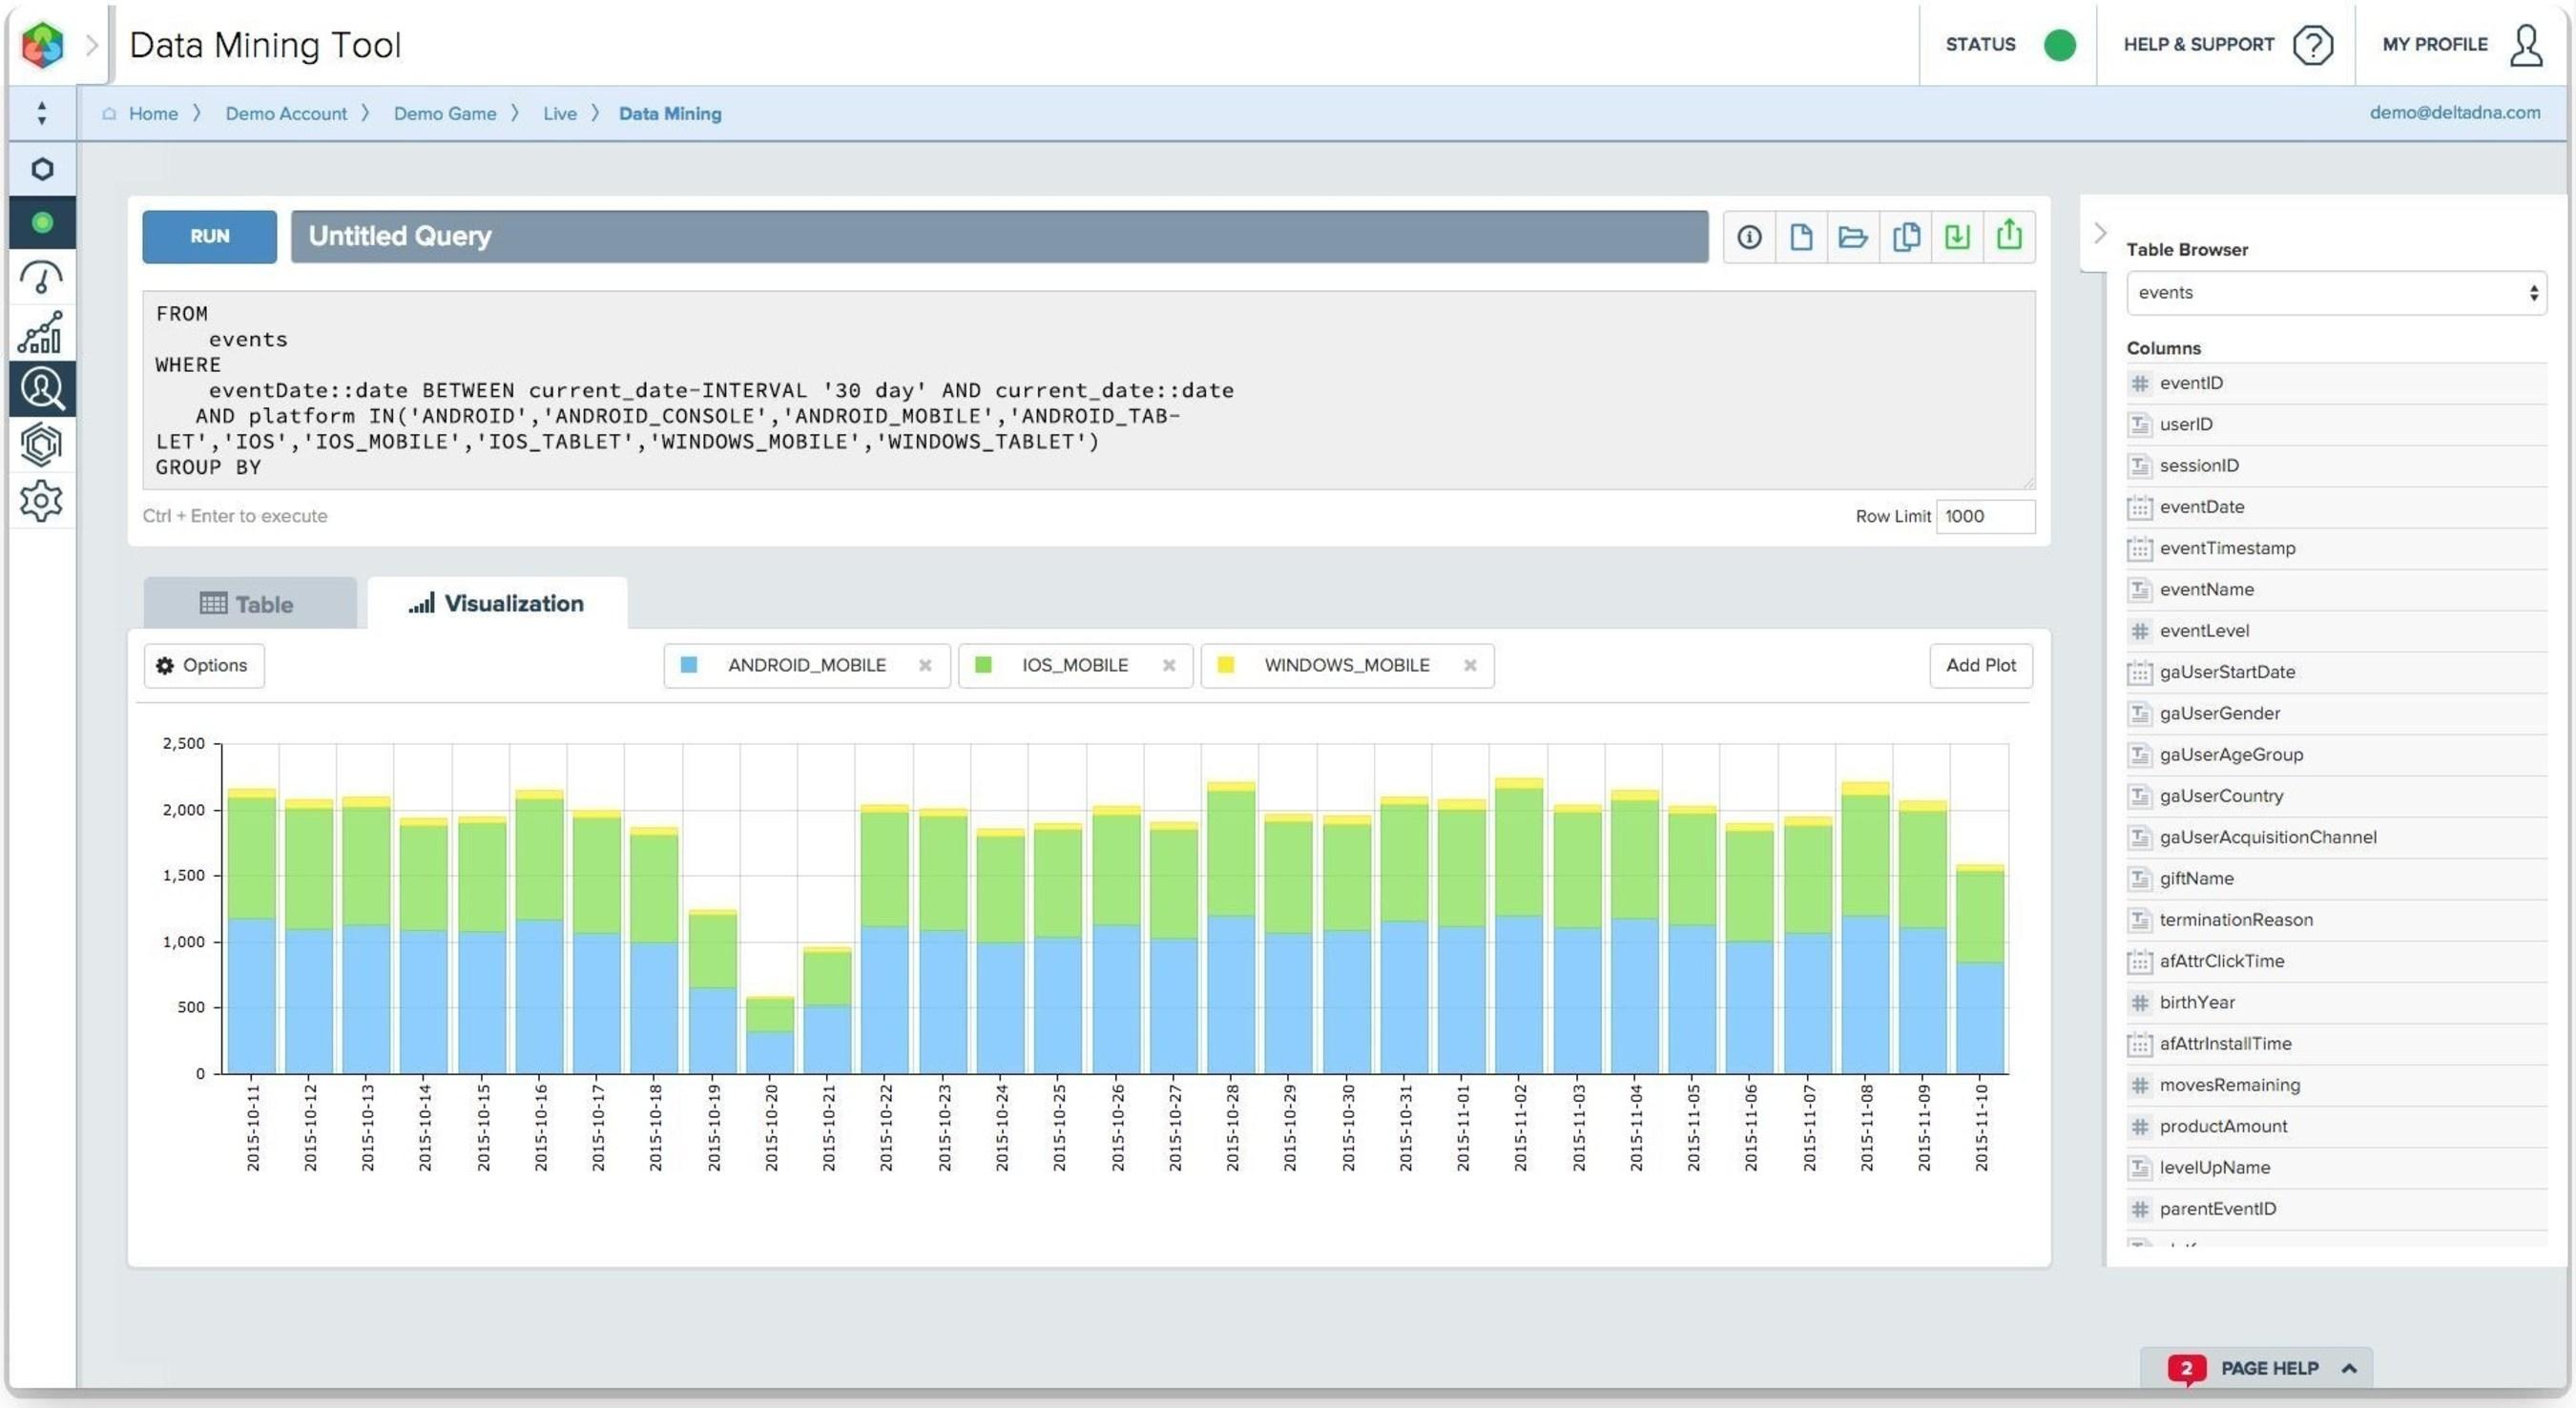 deltaDNA Launches Deep Data Visualization